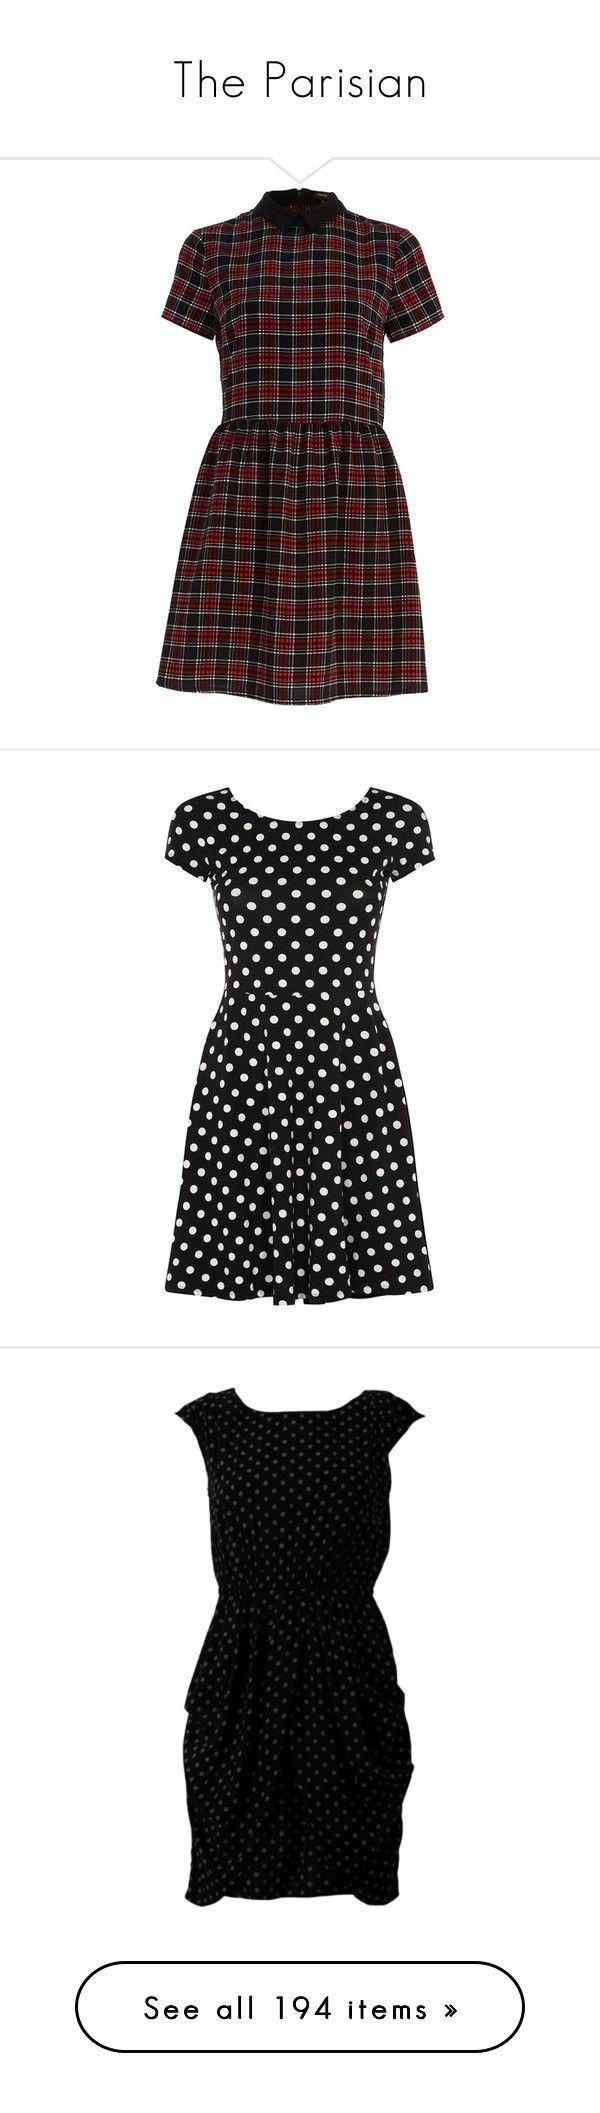 """The Parisian"" by spuddster ❤ liked on Polyvore featuring dresses, sale, tartan skater dress, river island dresses, tartan dresses, tartan plaid dress, short-sleeve dresses, vestidos, short dresses and short-sleeve skater dresses"